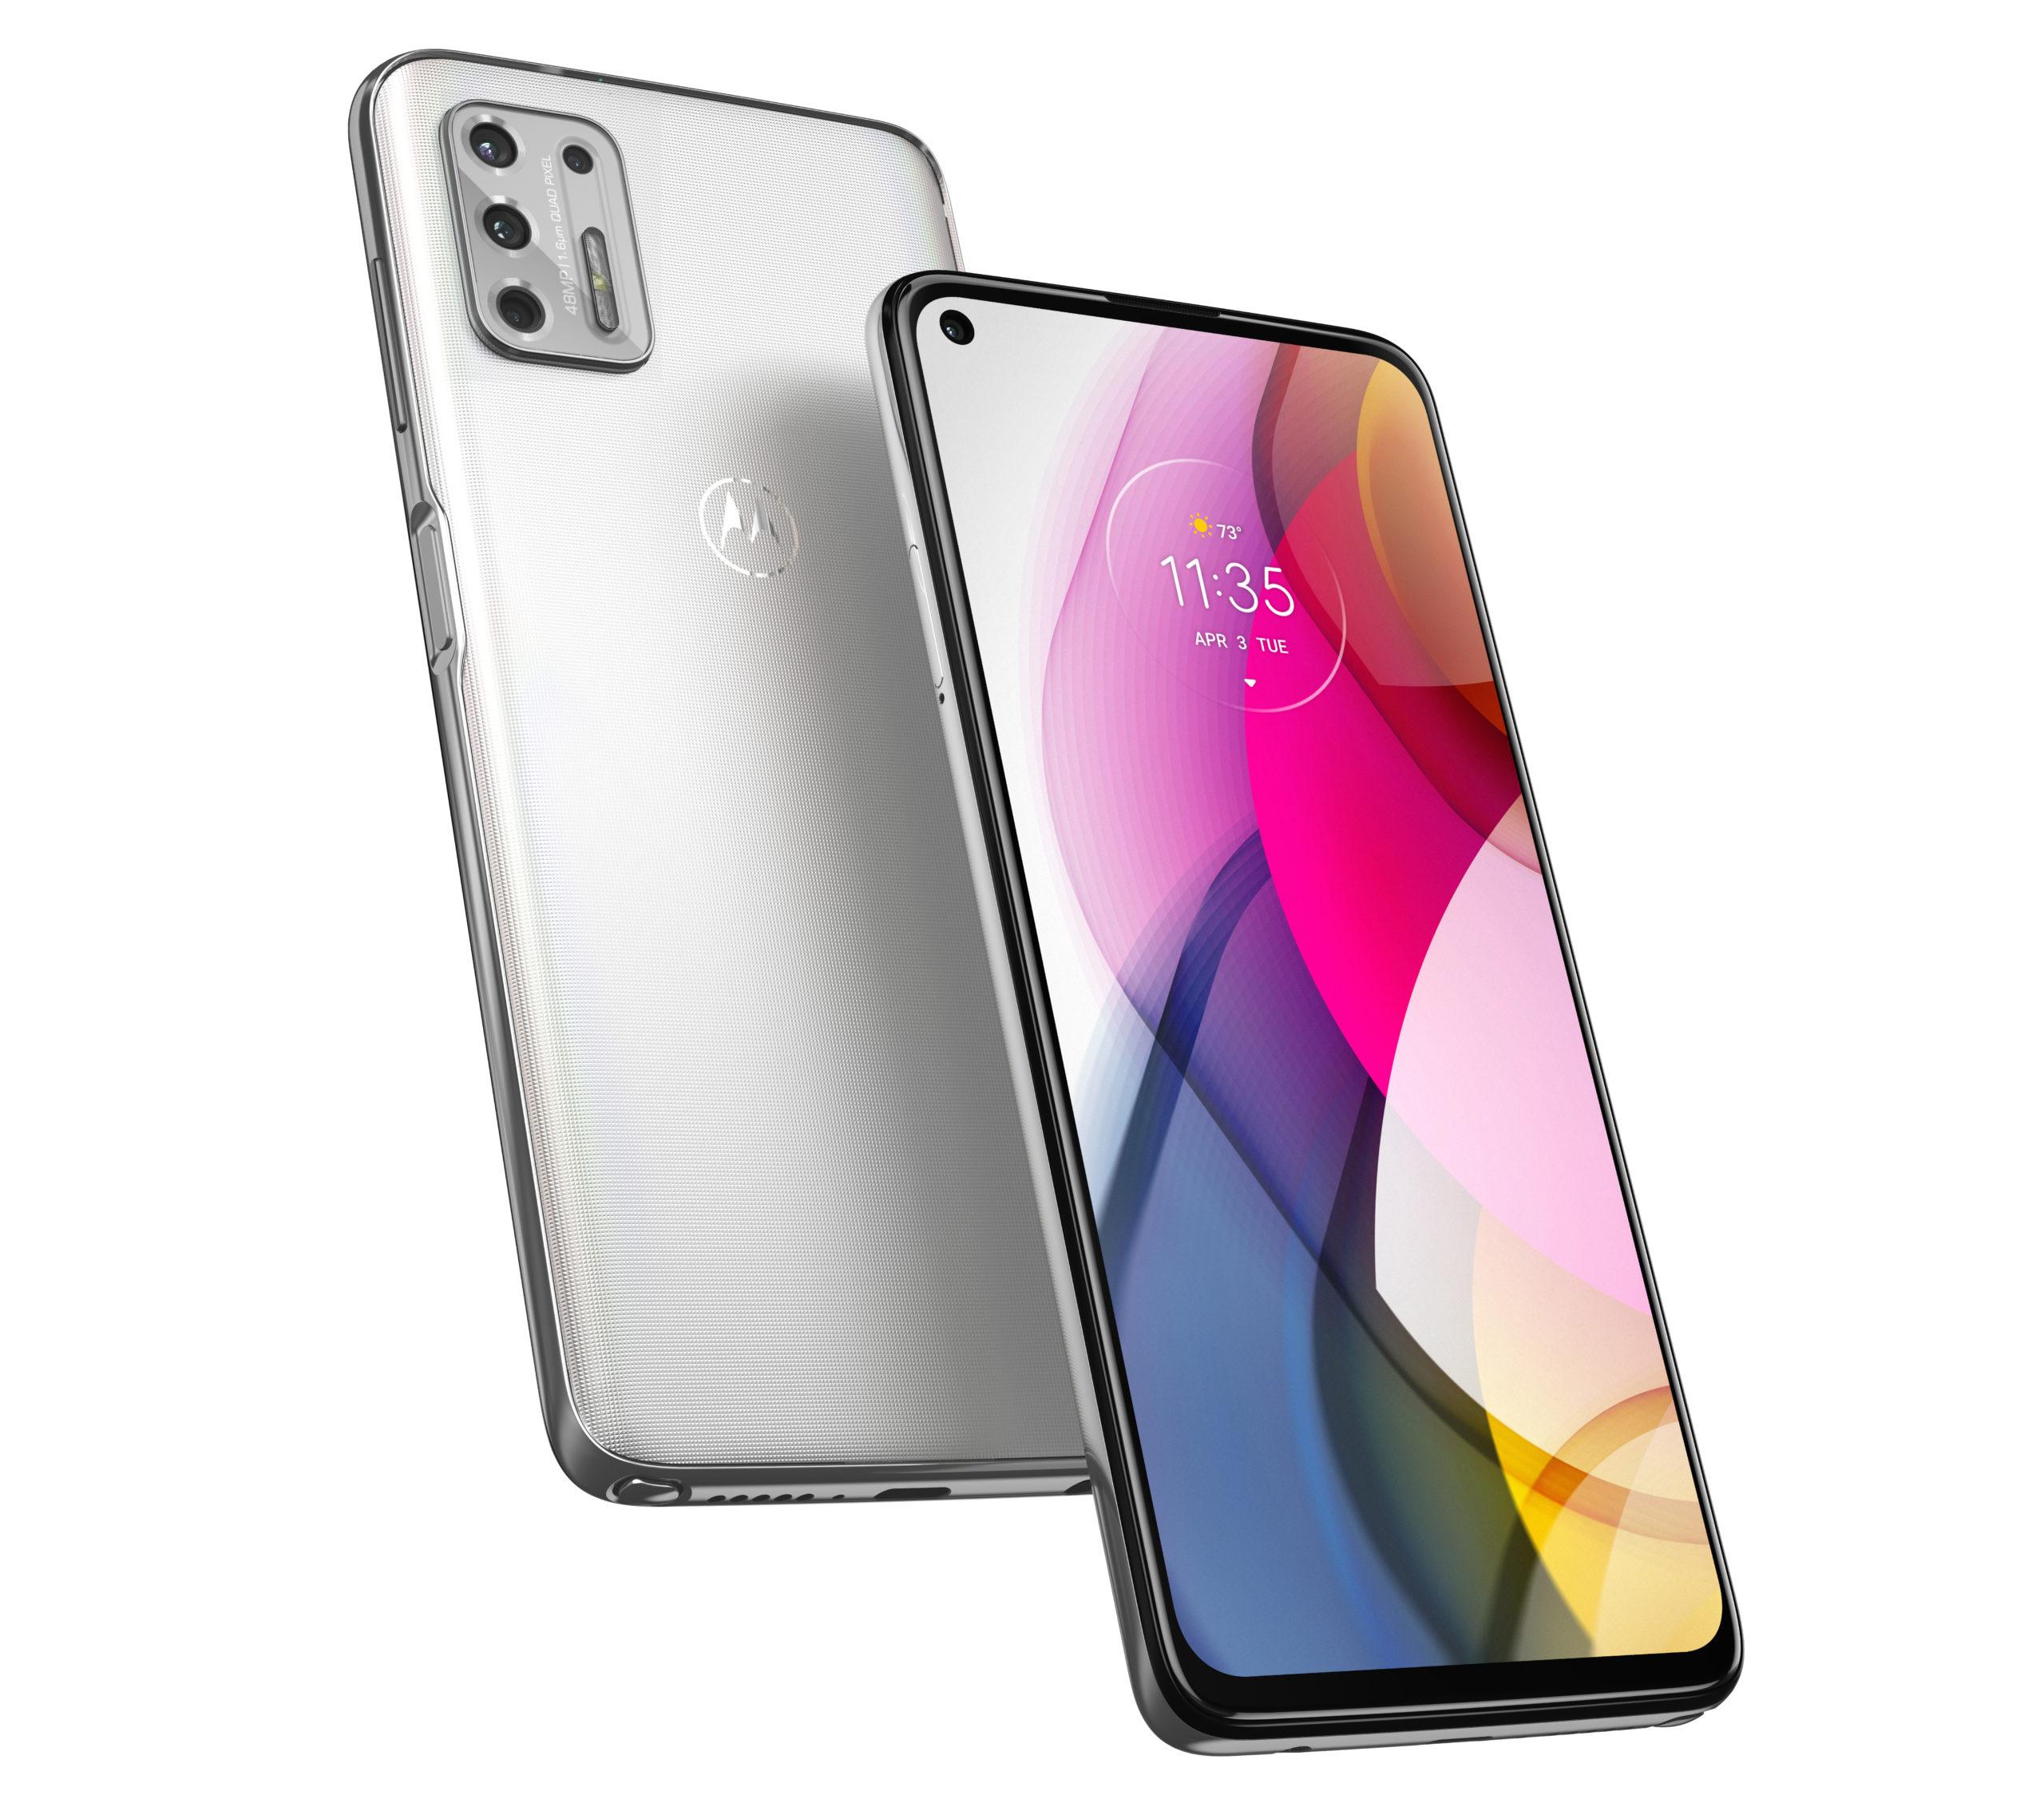 Motorola launches three new mid-tier G-series smartphones in the US